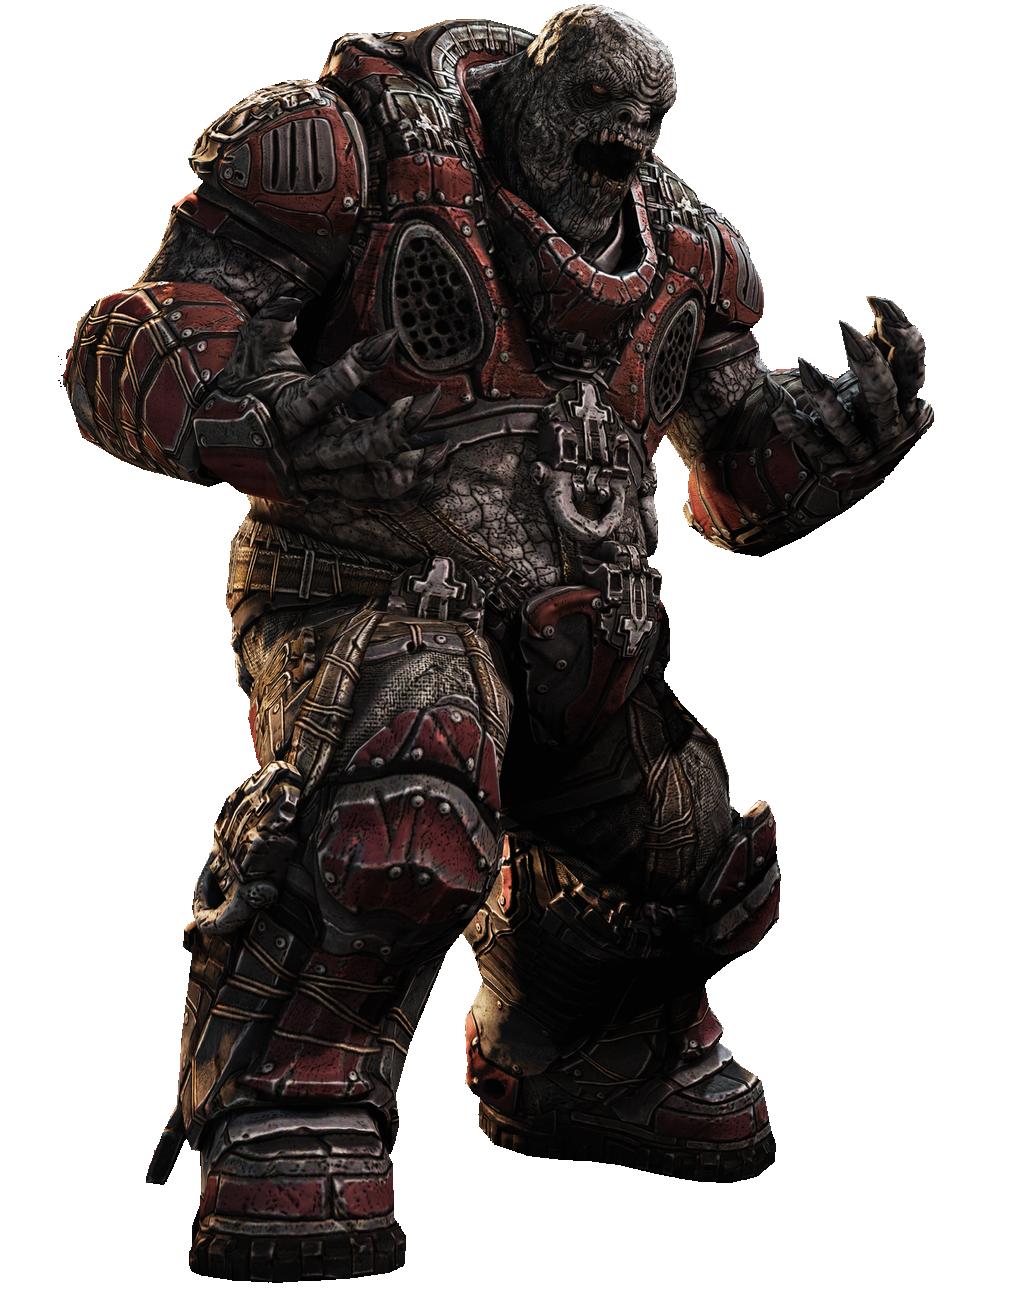 Renders Mortal Kombat , Gears